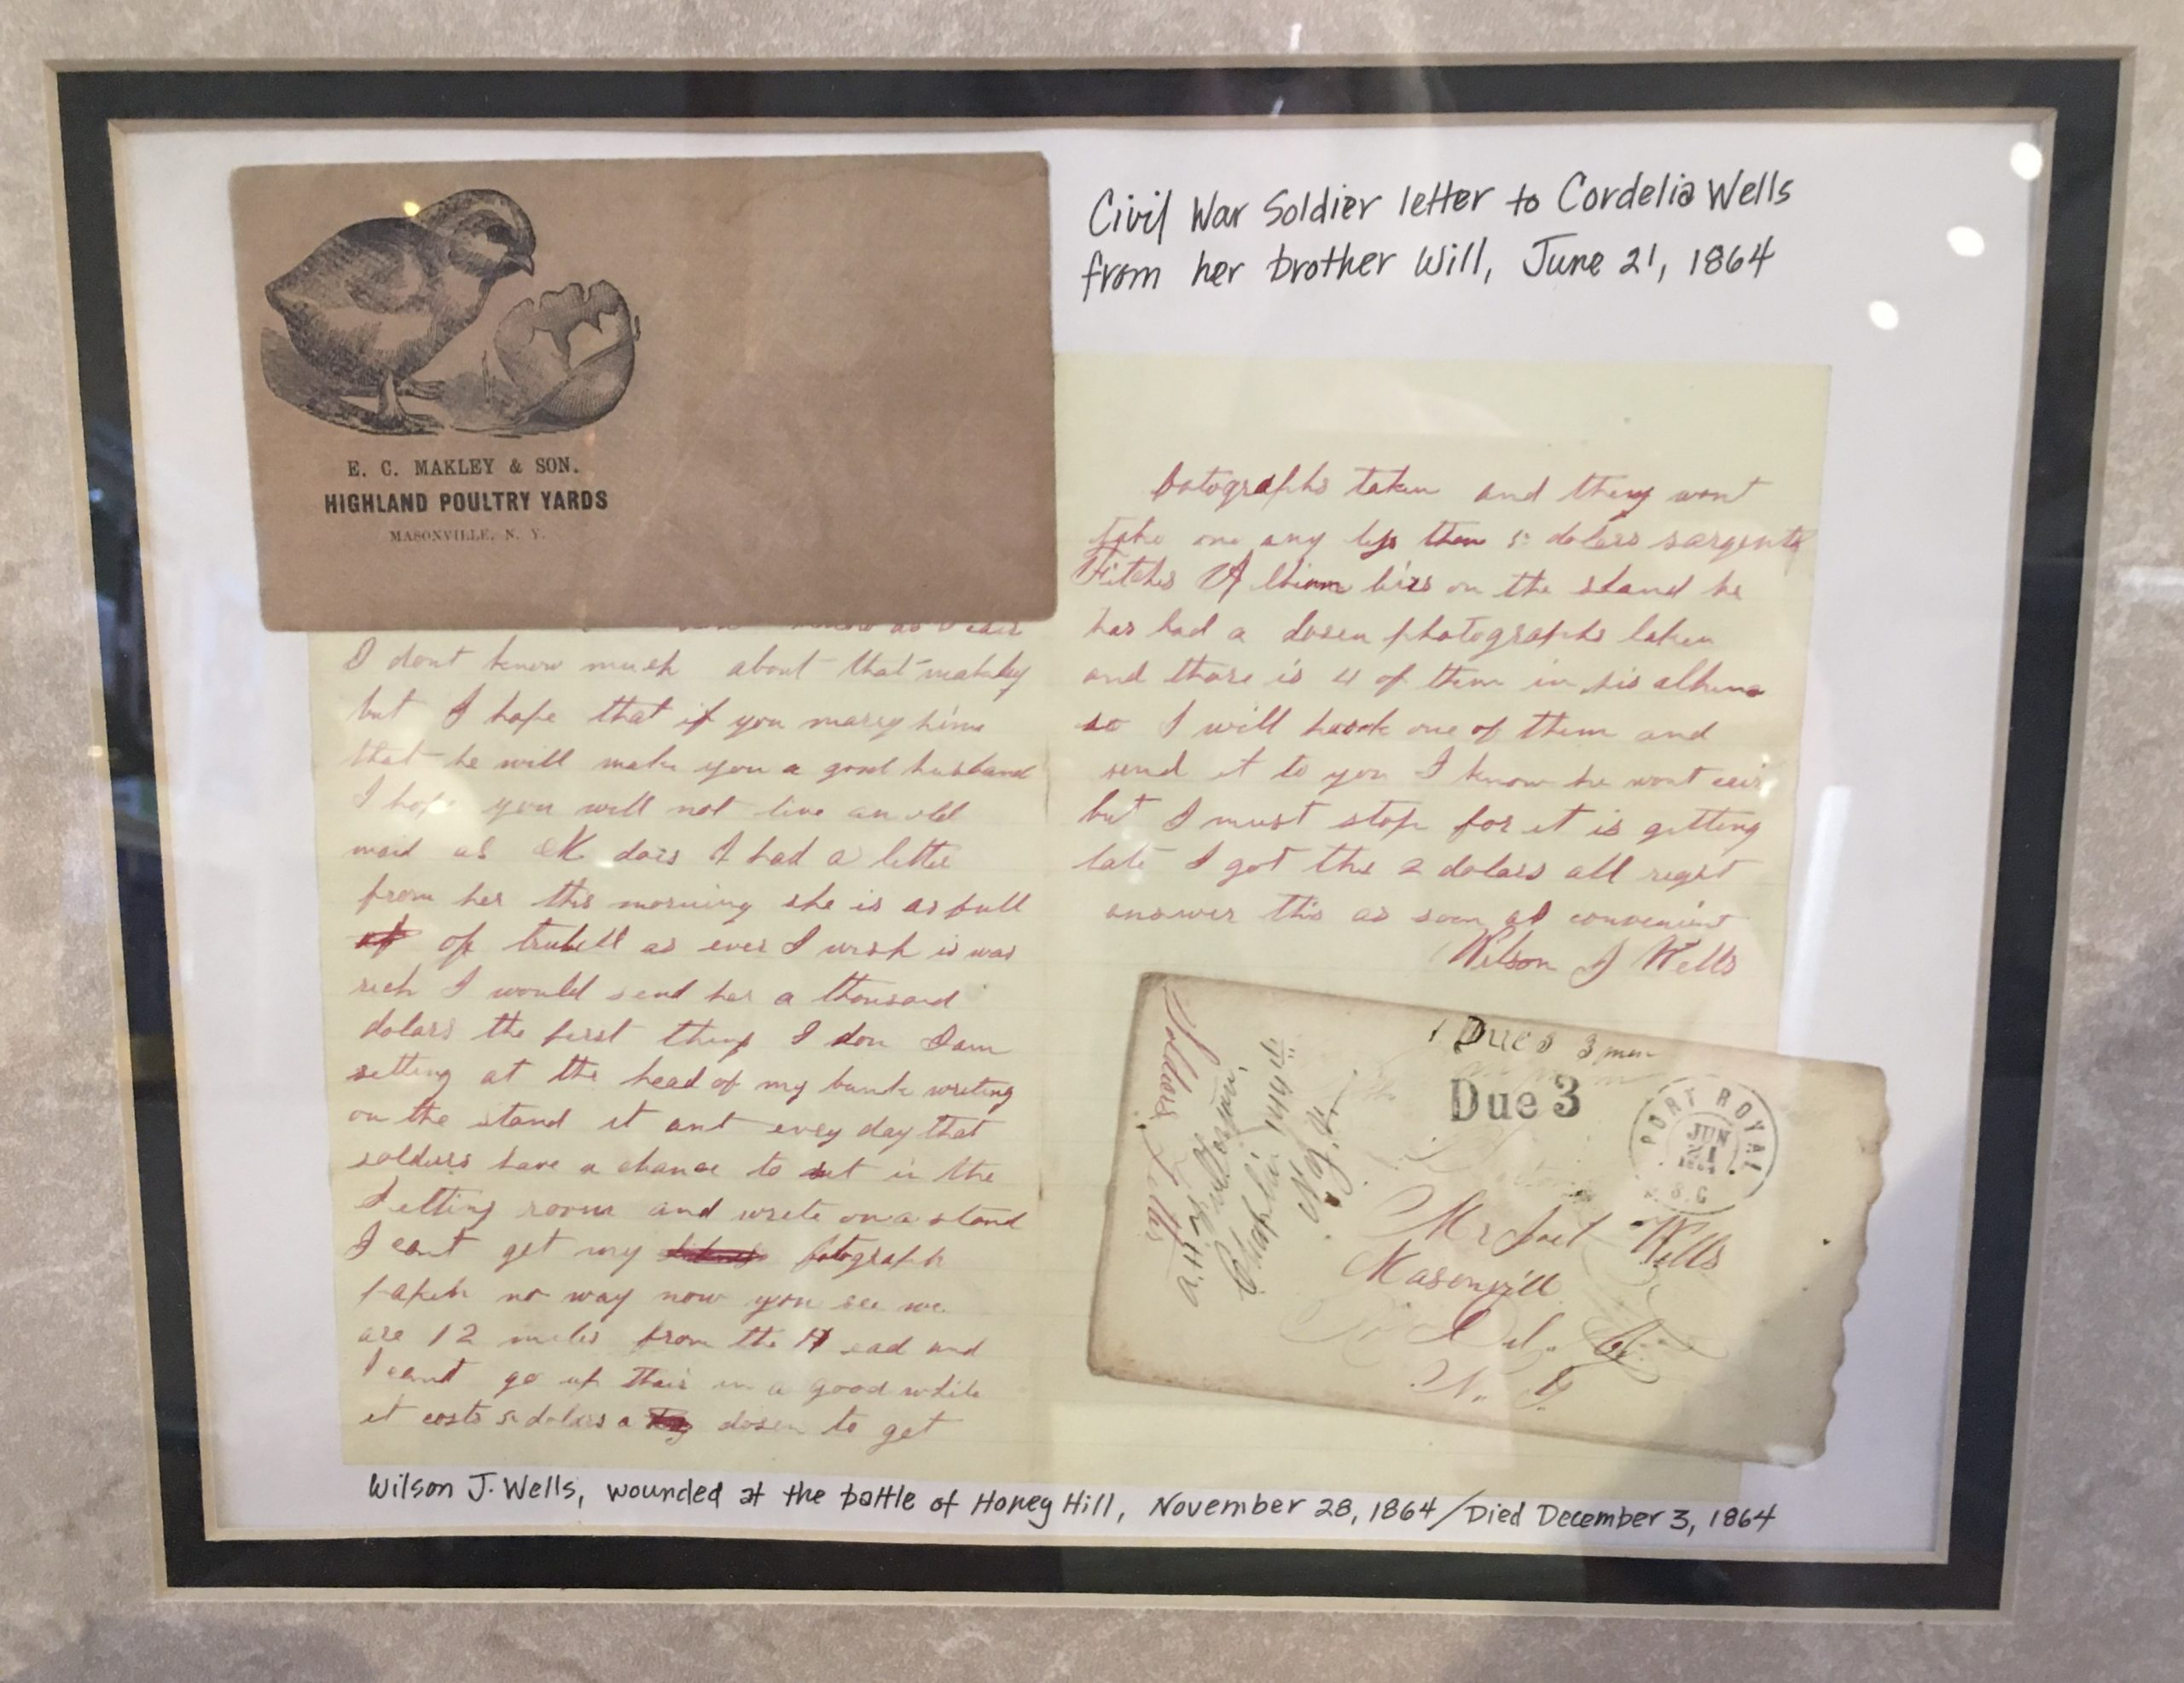 Civil War Letter